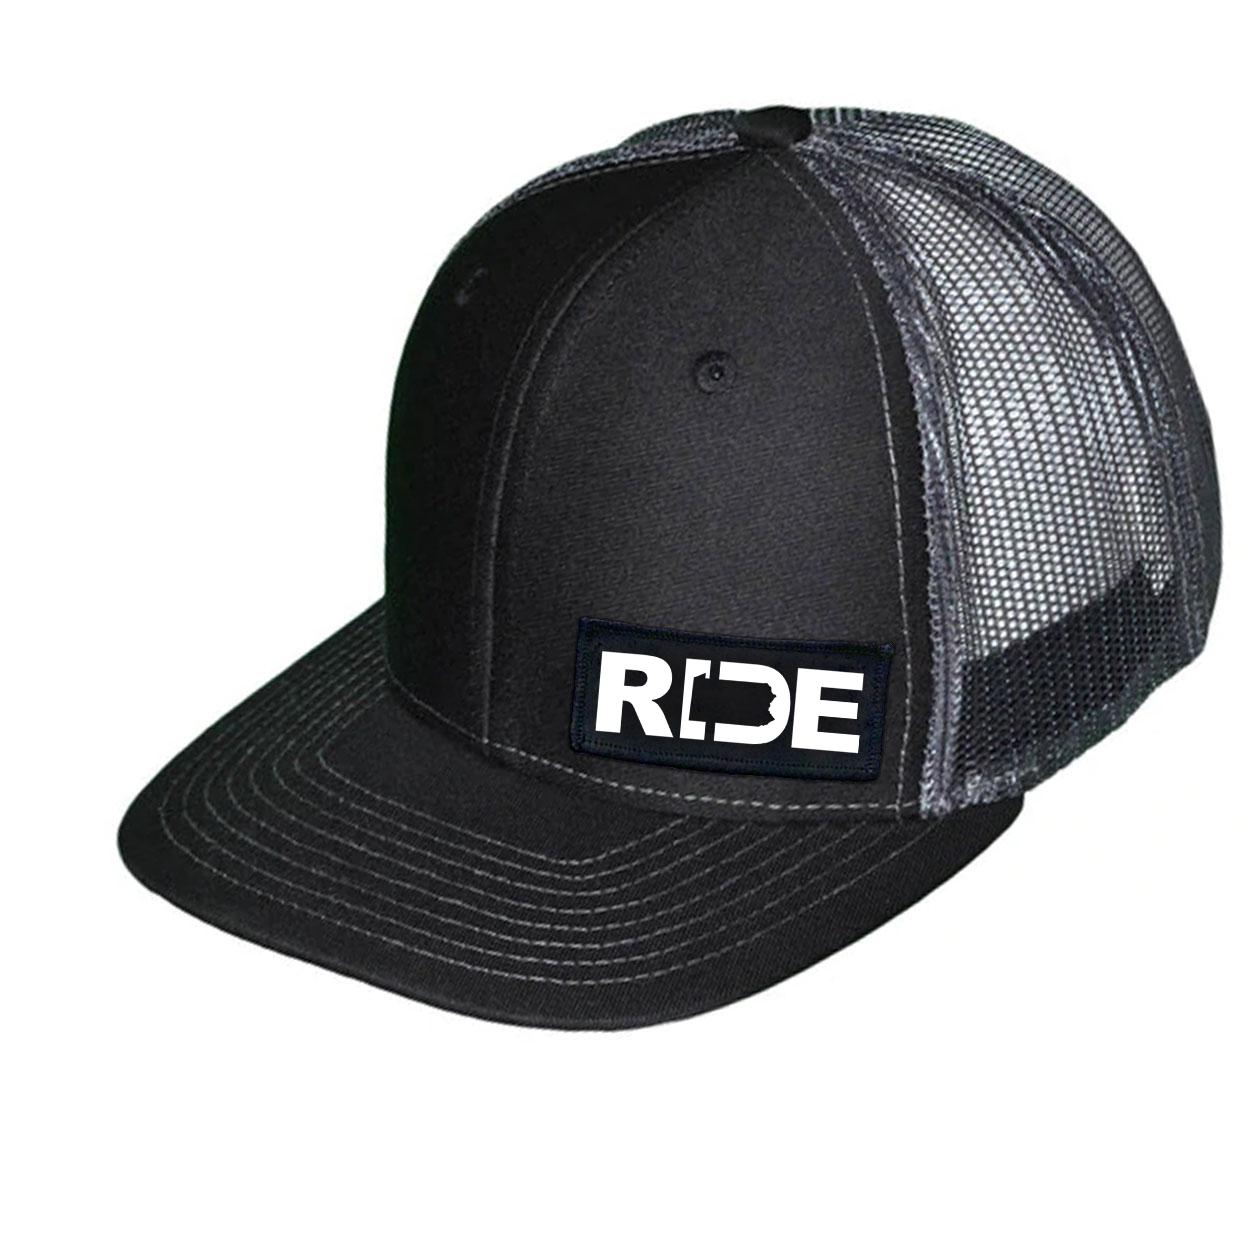 Ride Pennsylvania Night Out Woven Patch Snapback Trucker Hat Black/Dark Gray (White Logo)